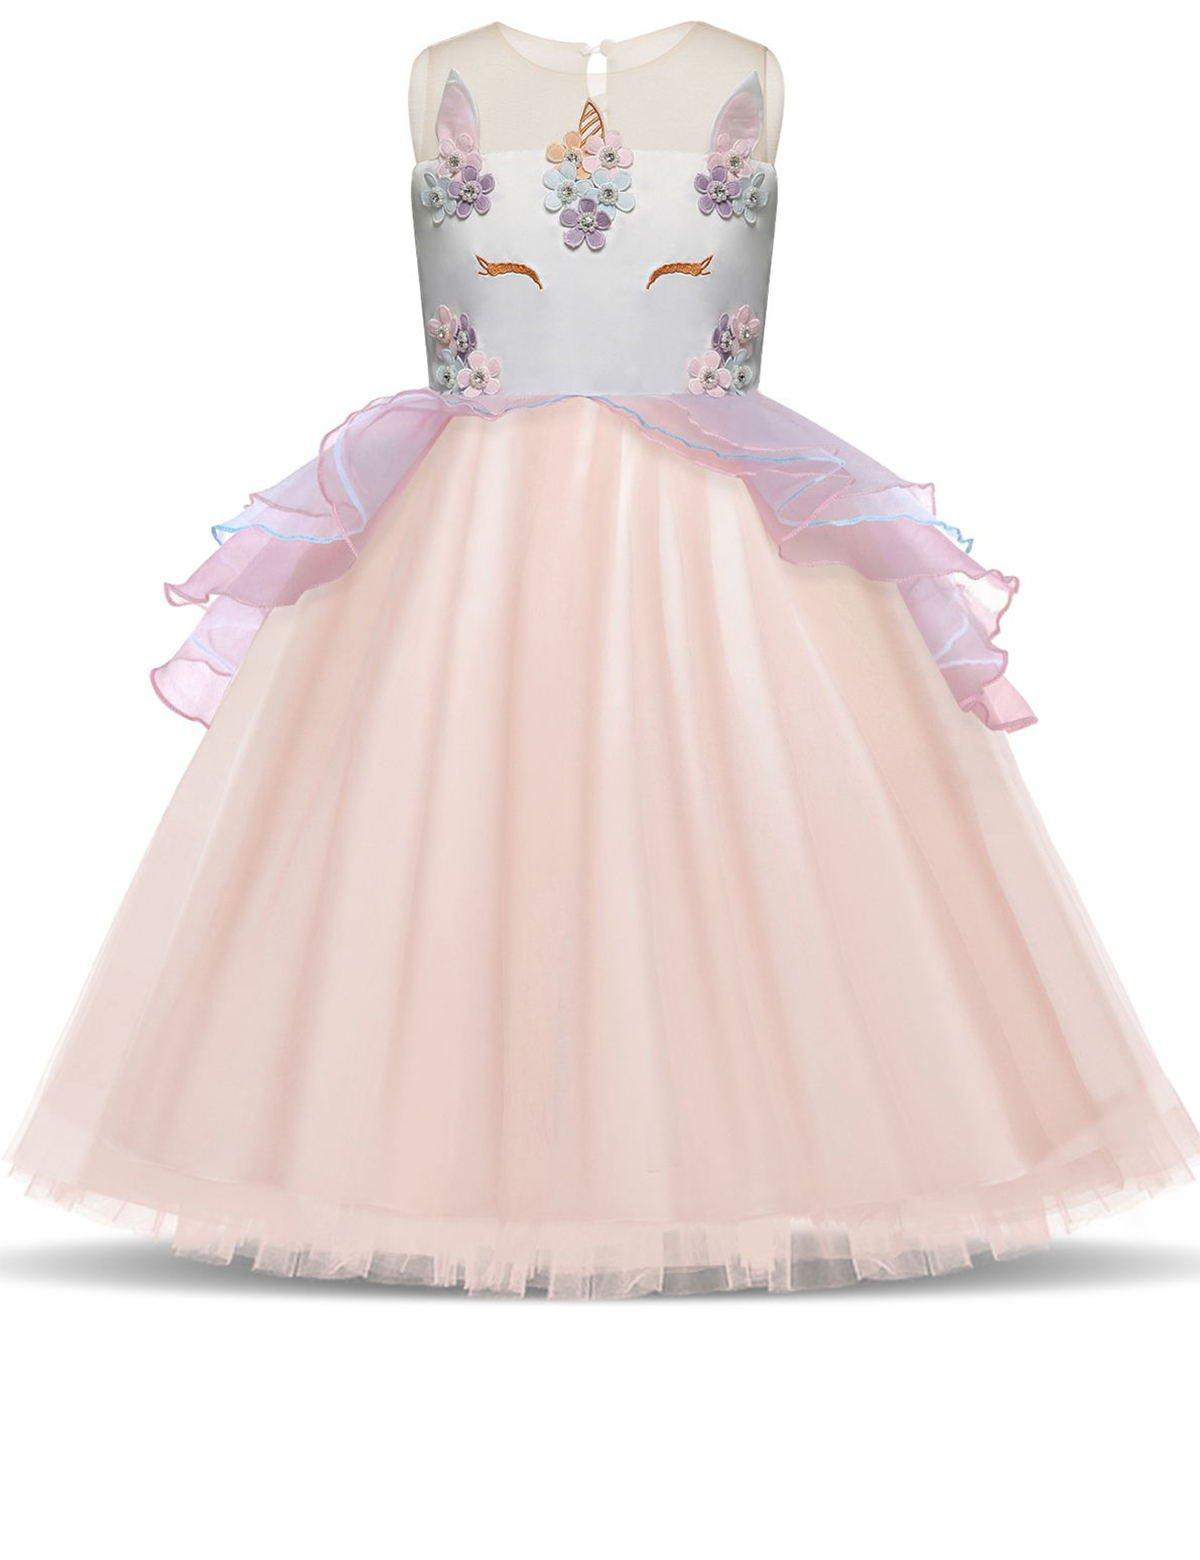 TTYAOVO Kids Unicorn Costume Dress Girl Princess Flower Pageant Party Tutu Dresses Size 3-4 Years Pink